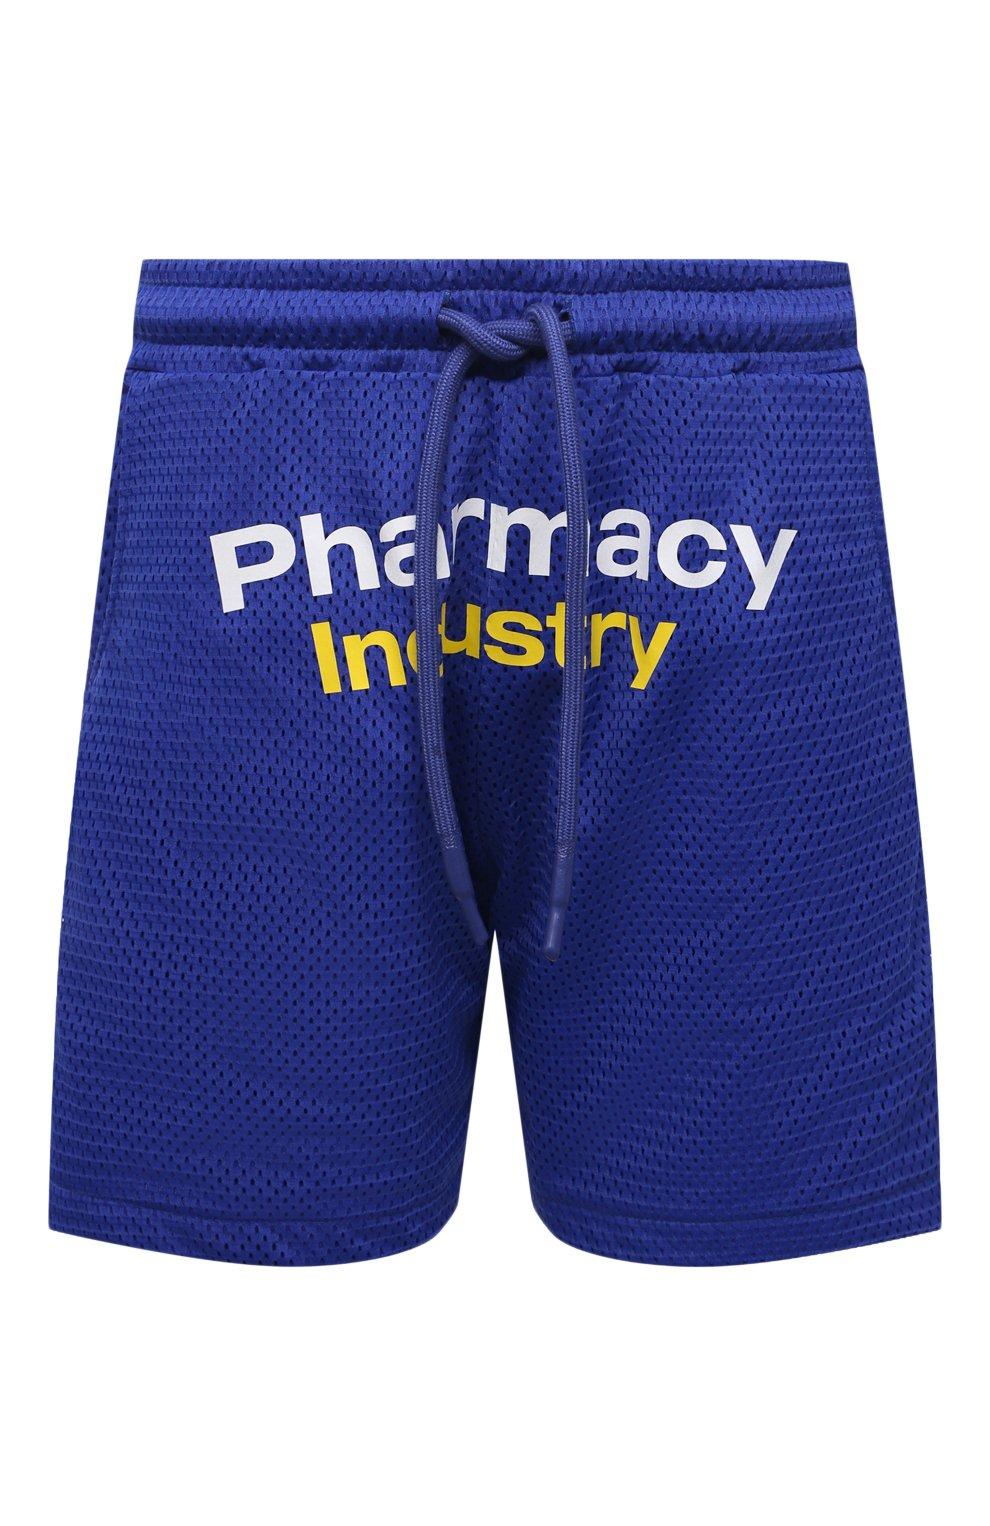 Мужские шорты PHARMACY INDUSTRY синего цвета, арт. PHM230 | Фото 1